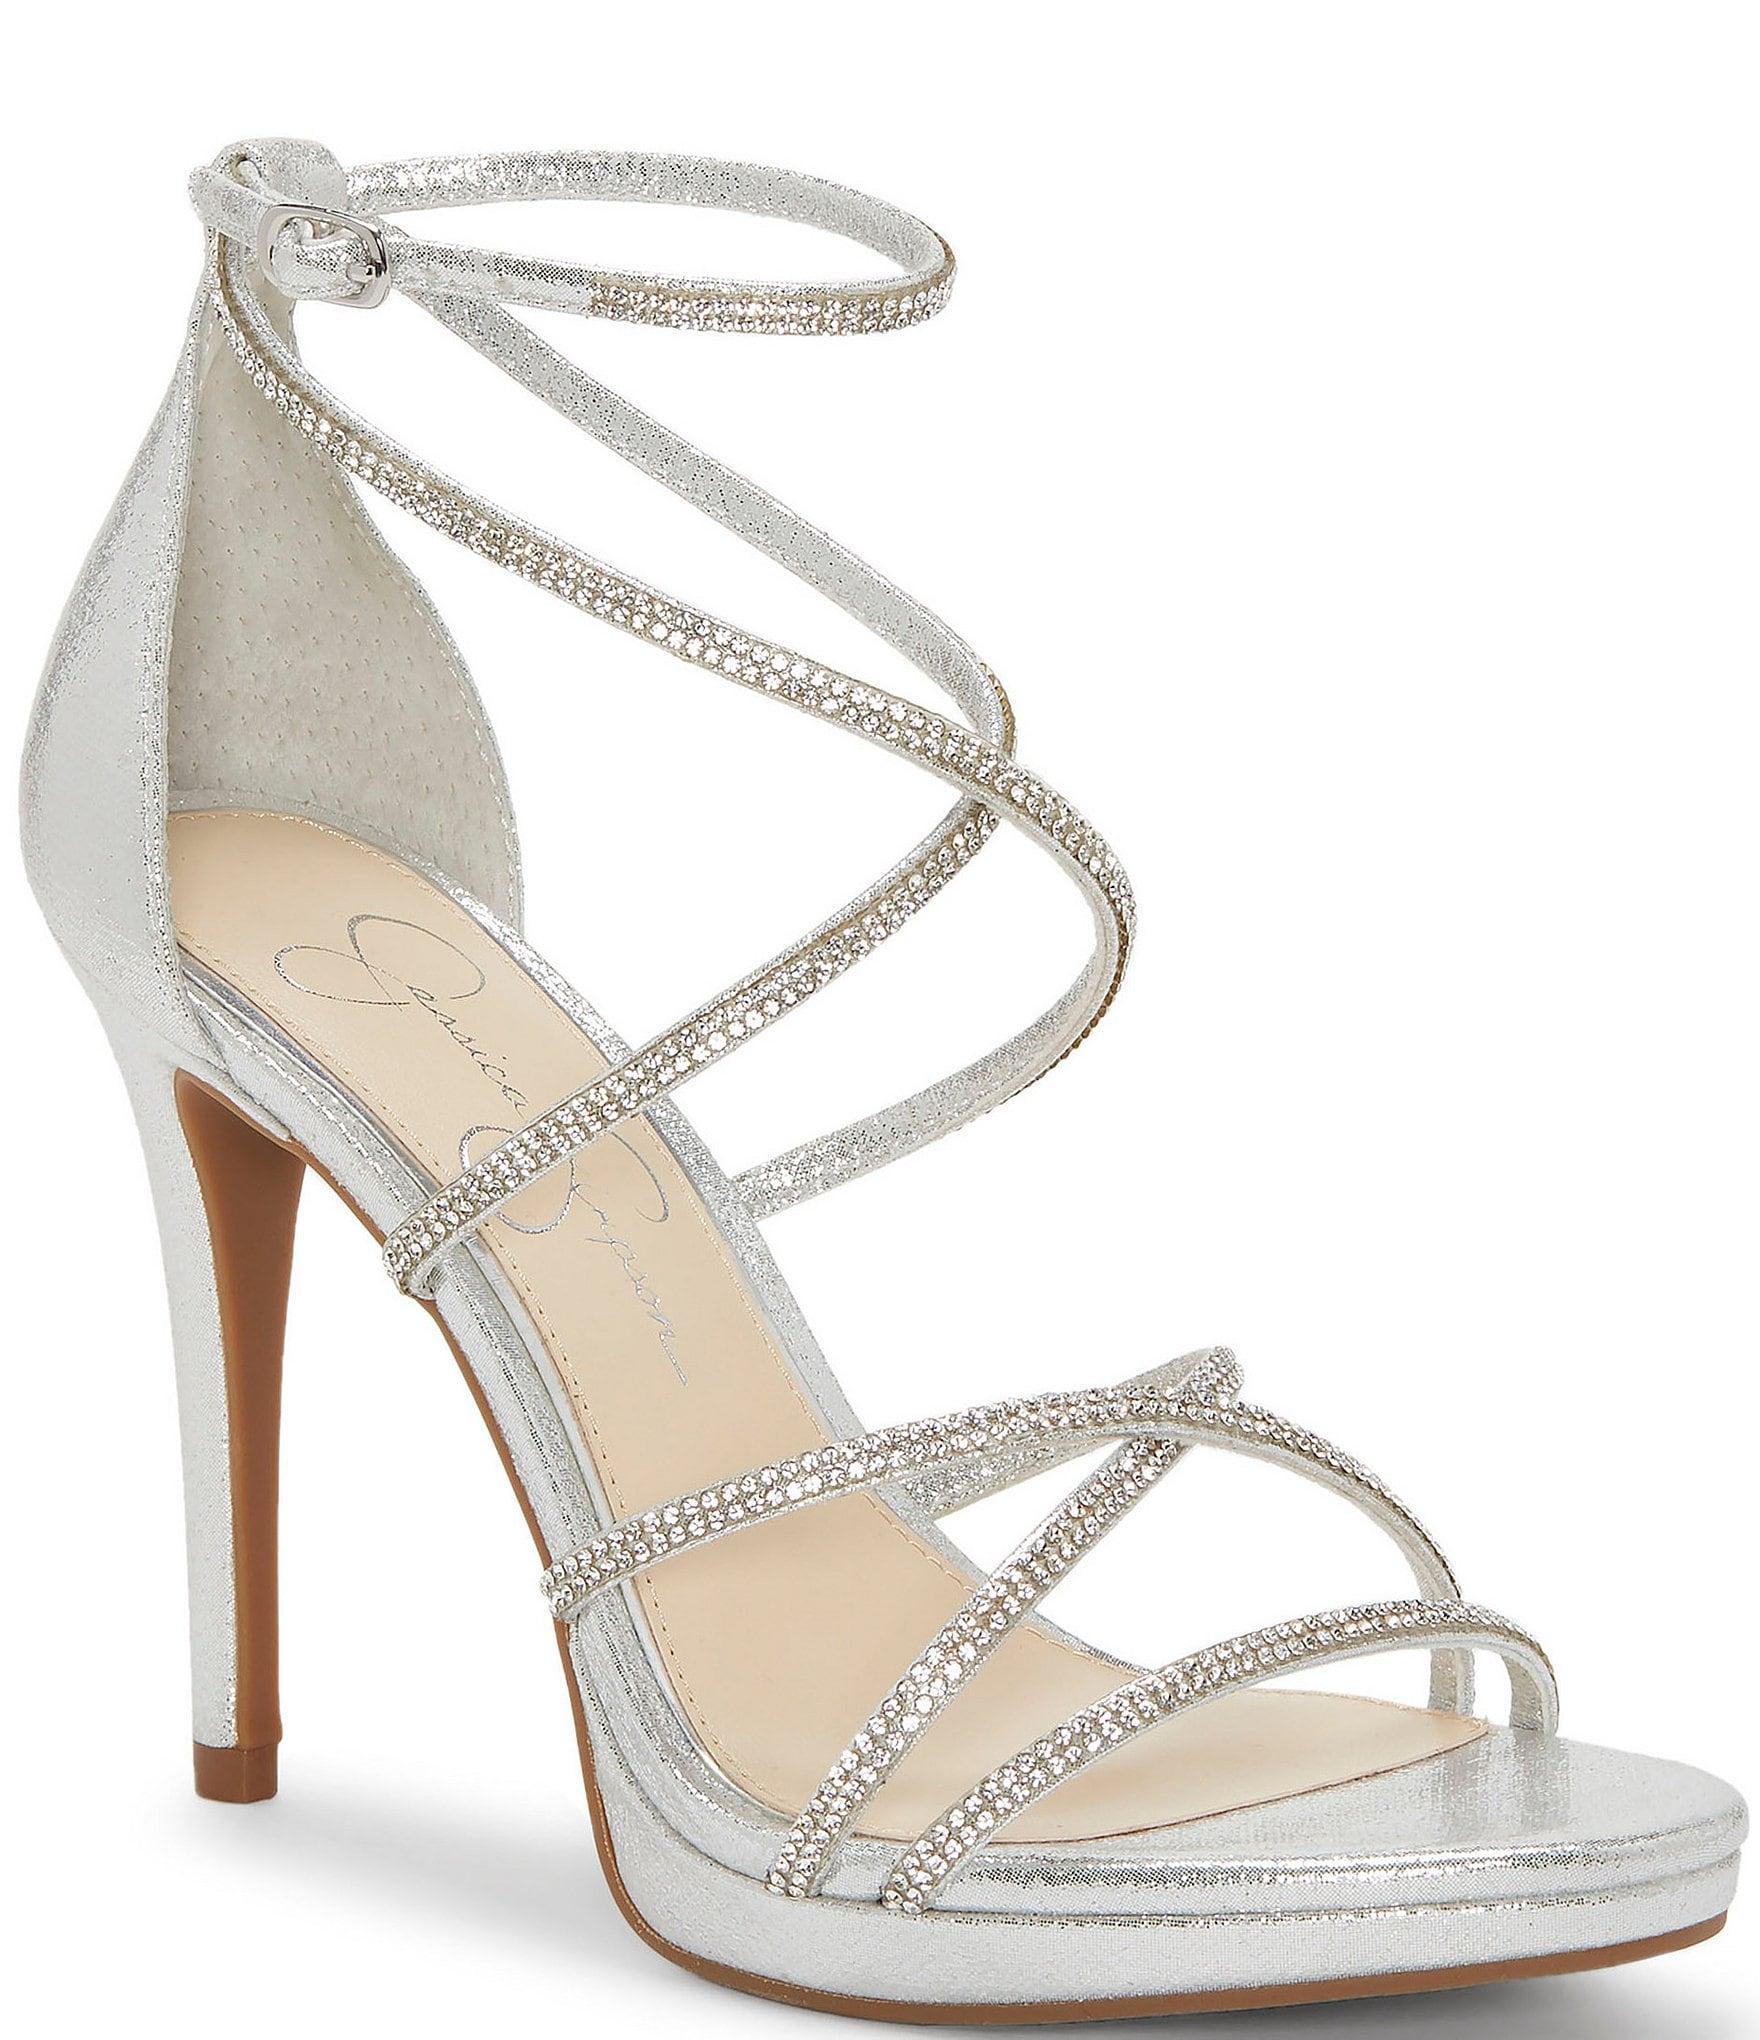 01302dd6e1e5 Jessica Simpson Women s Extended Size Shoes